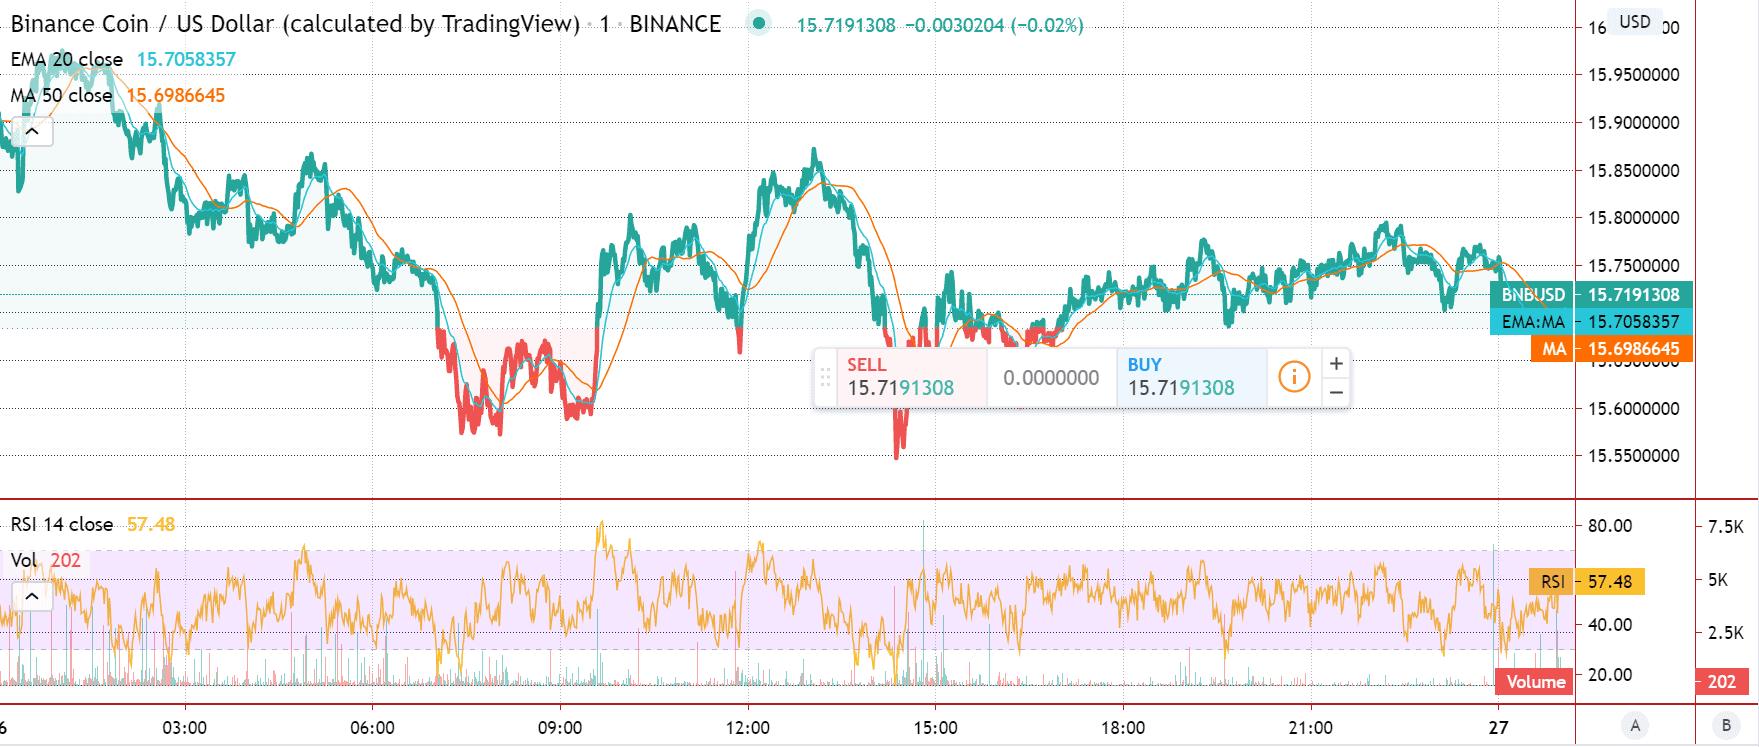 Binance Coin price chart 2 - 26 June